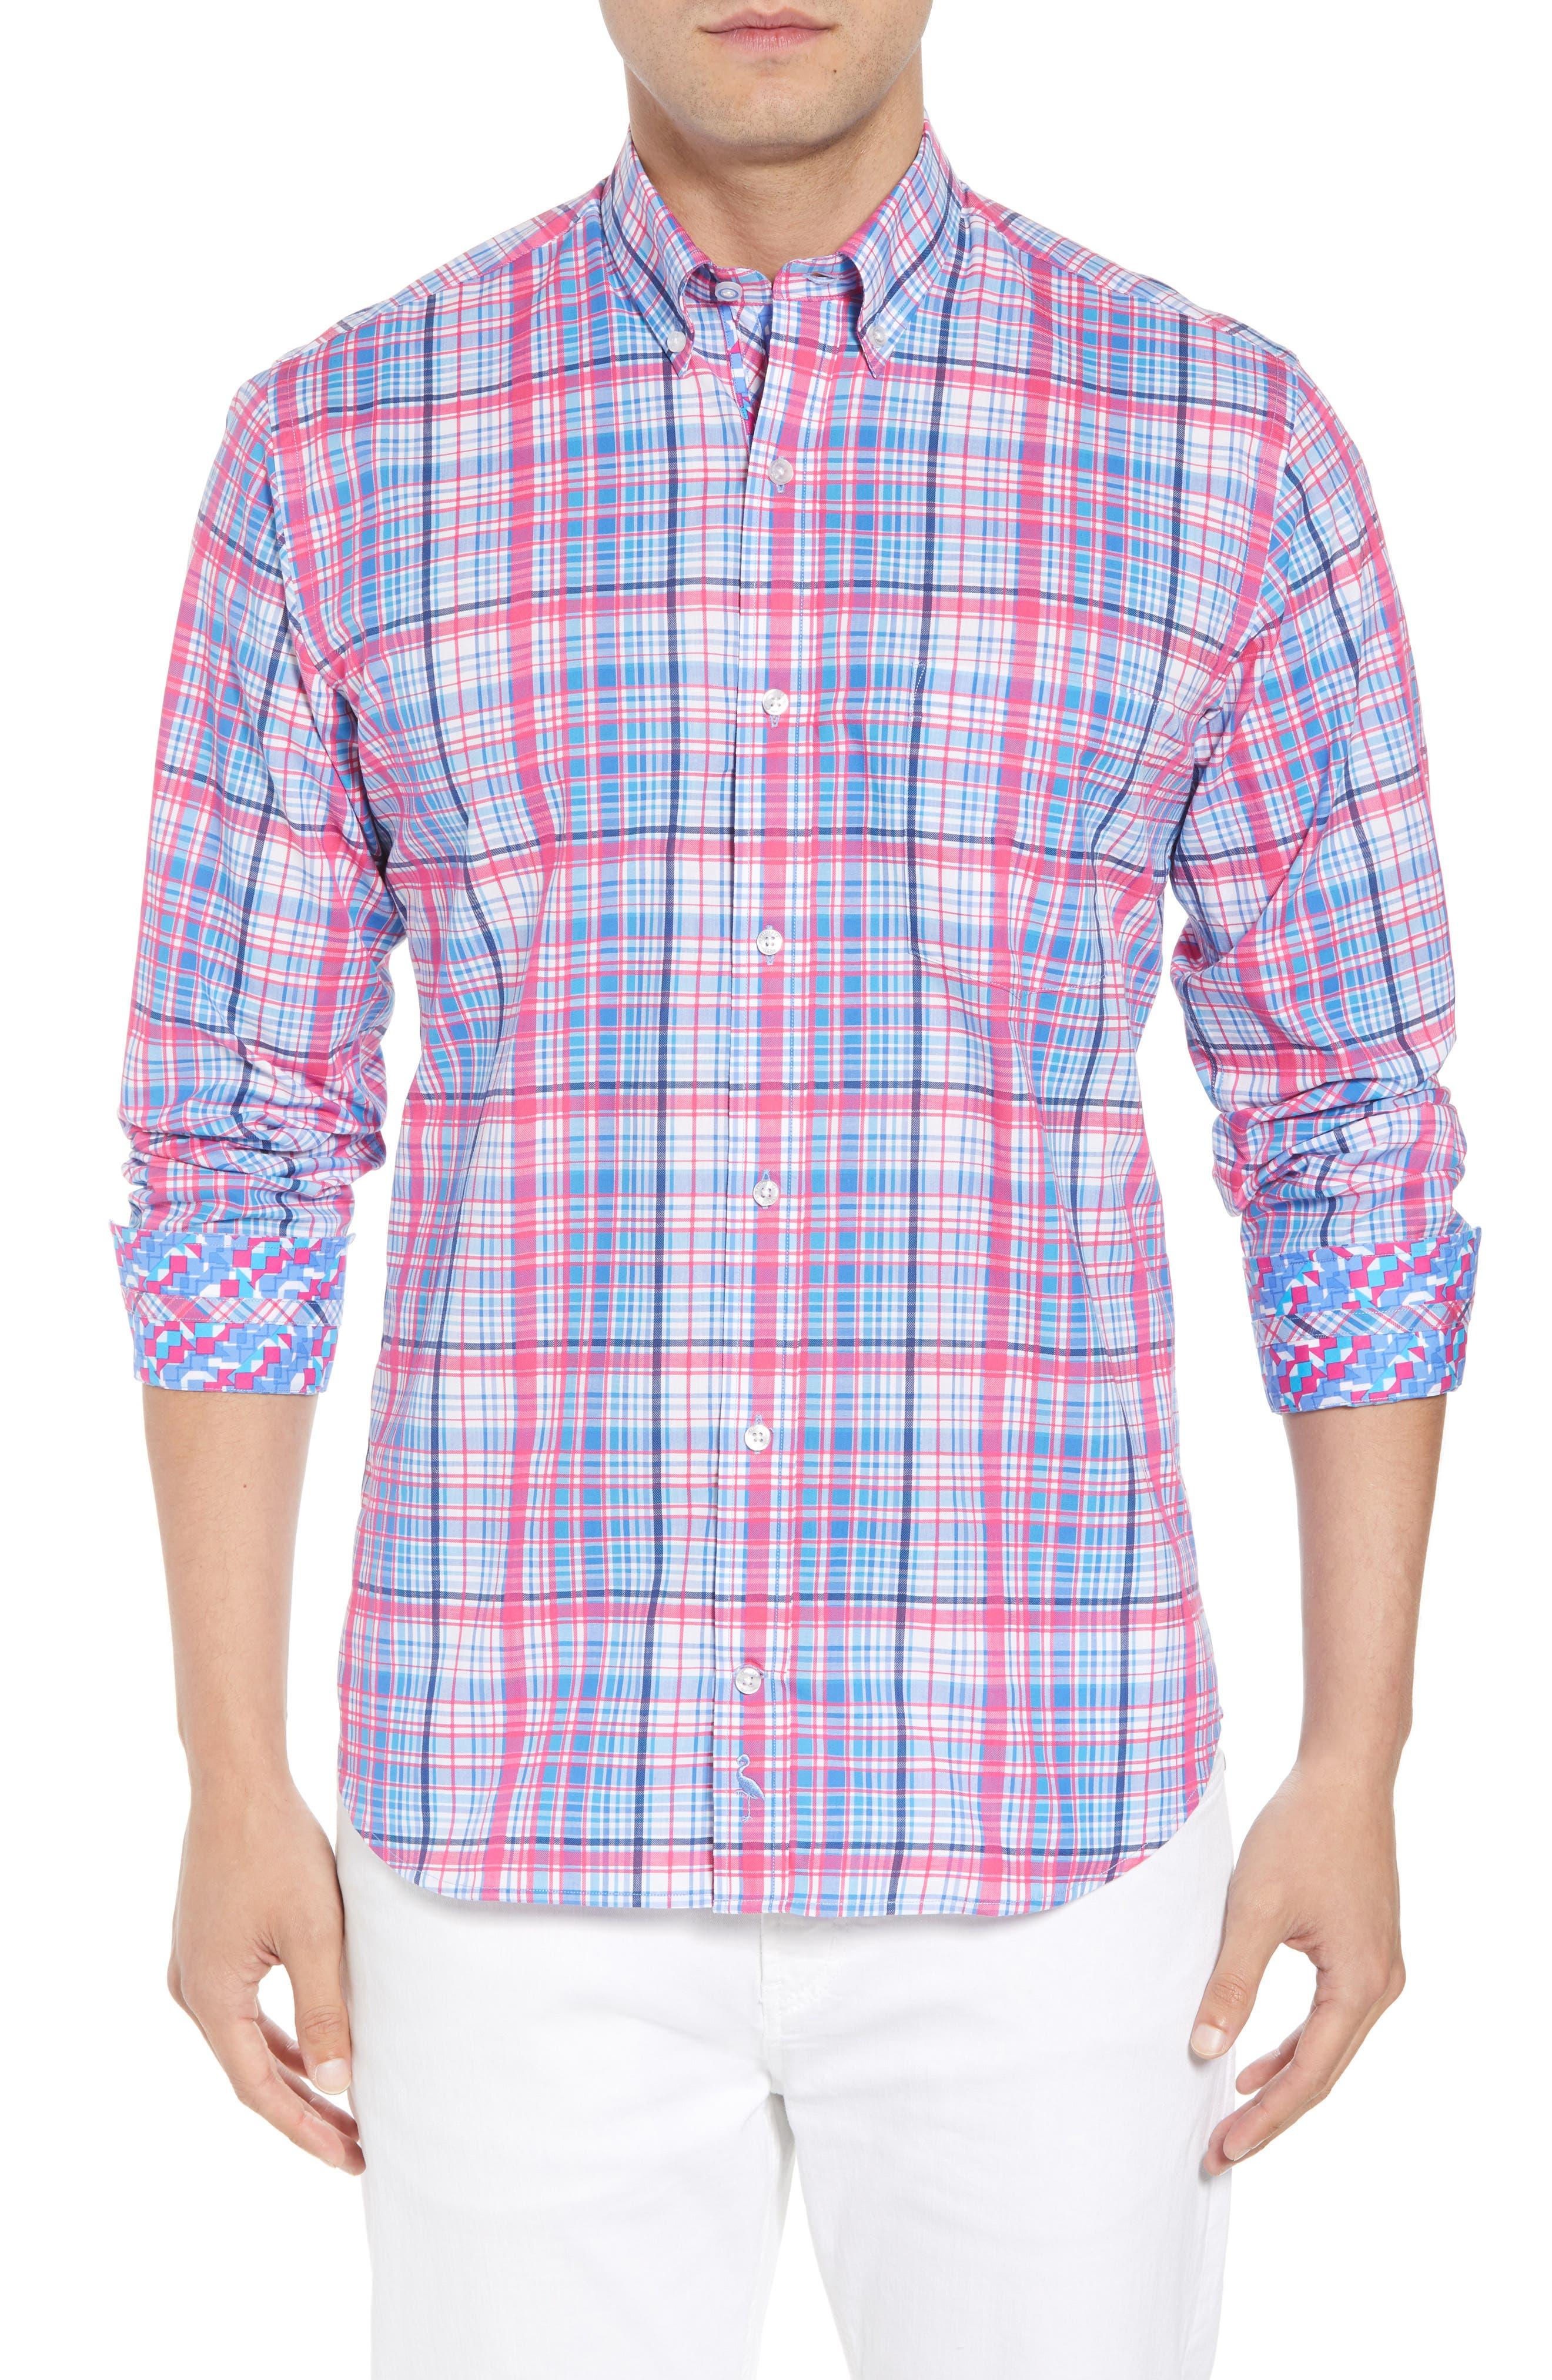 Beacon Regular Fit Plaid Sport Shirt,                             Main thumbnail 1, color,                             650